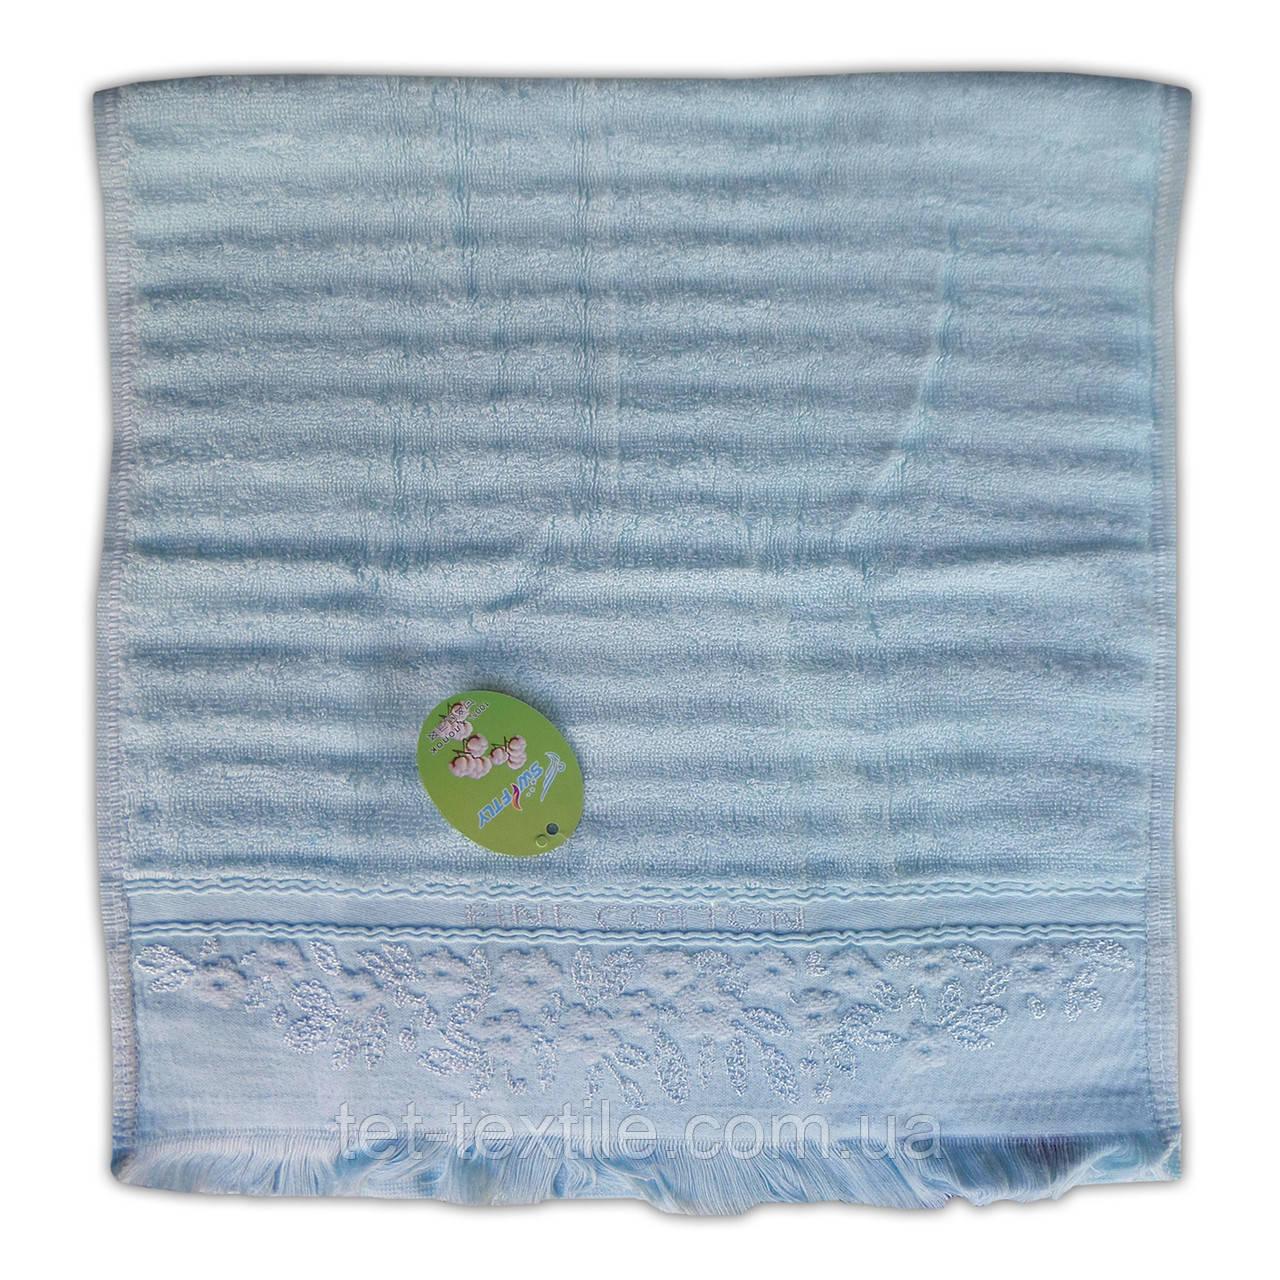 "Полотенце для кухни махровое с бахромой ""Голубое"" 30х60см."